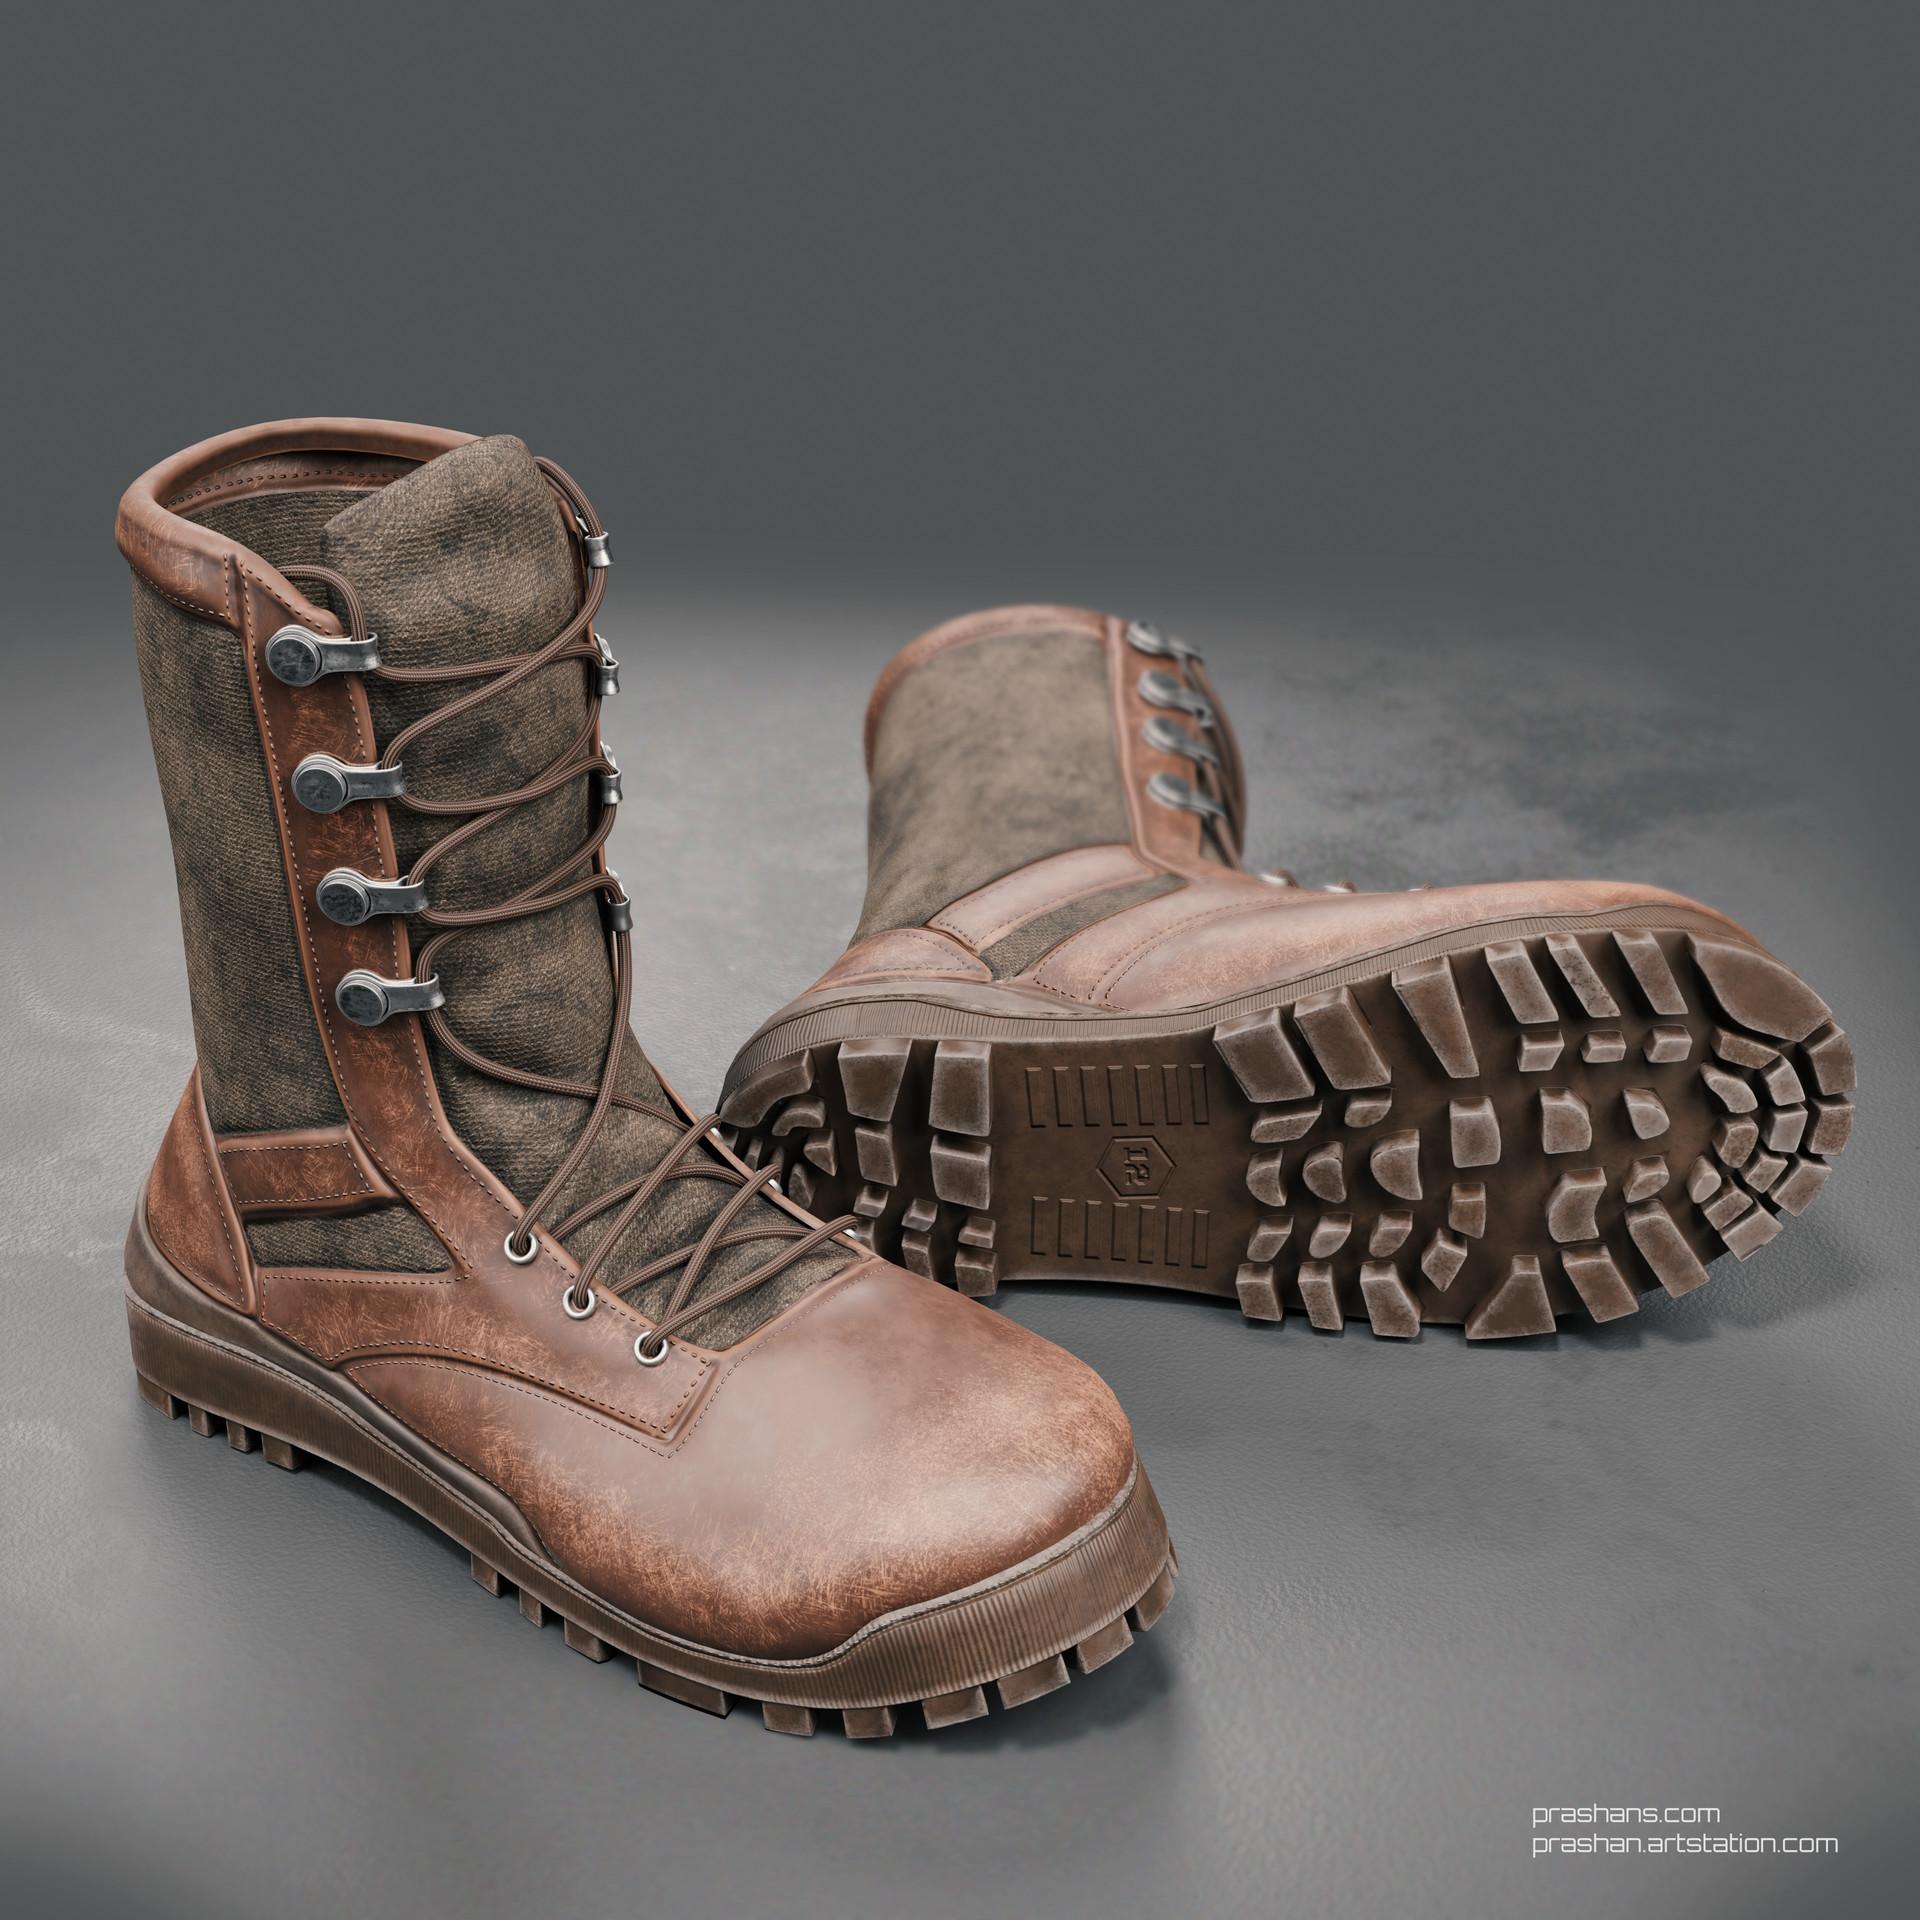 Prashan subasinghe boot 01e